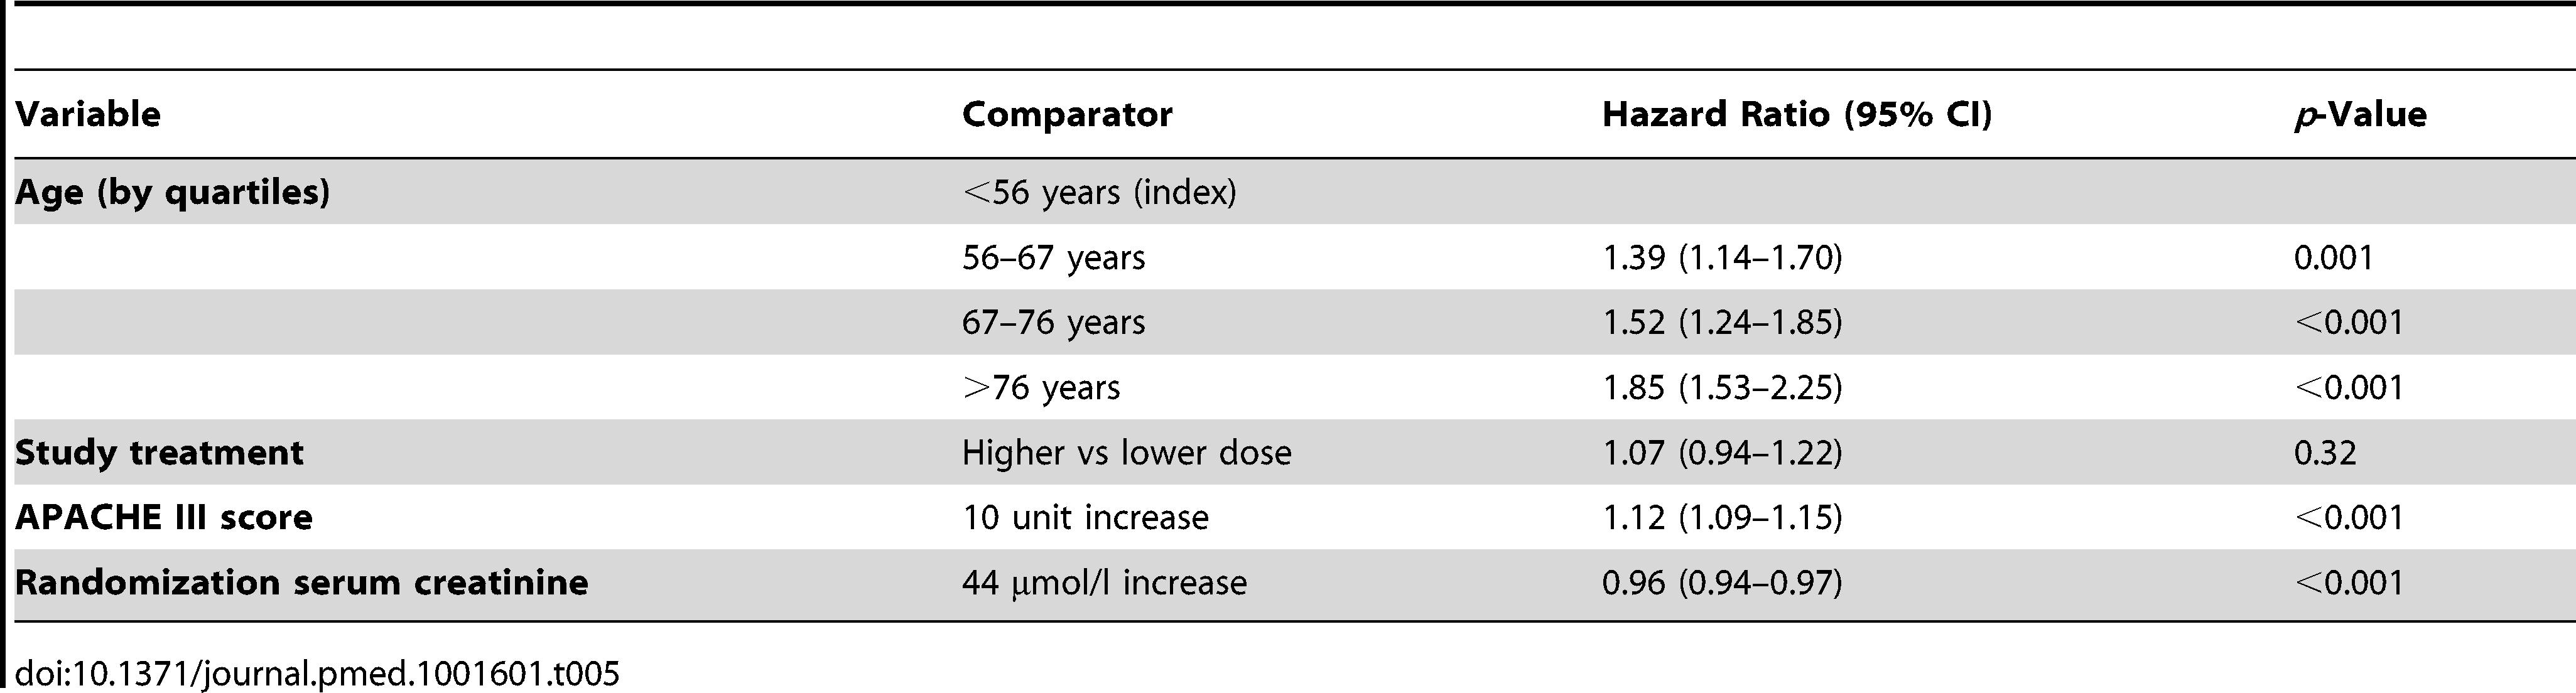 Cox multivariate model for long-term mortality from randomization.